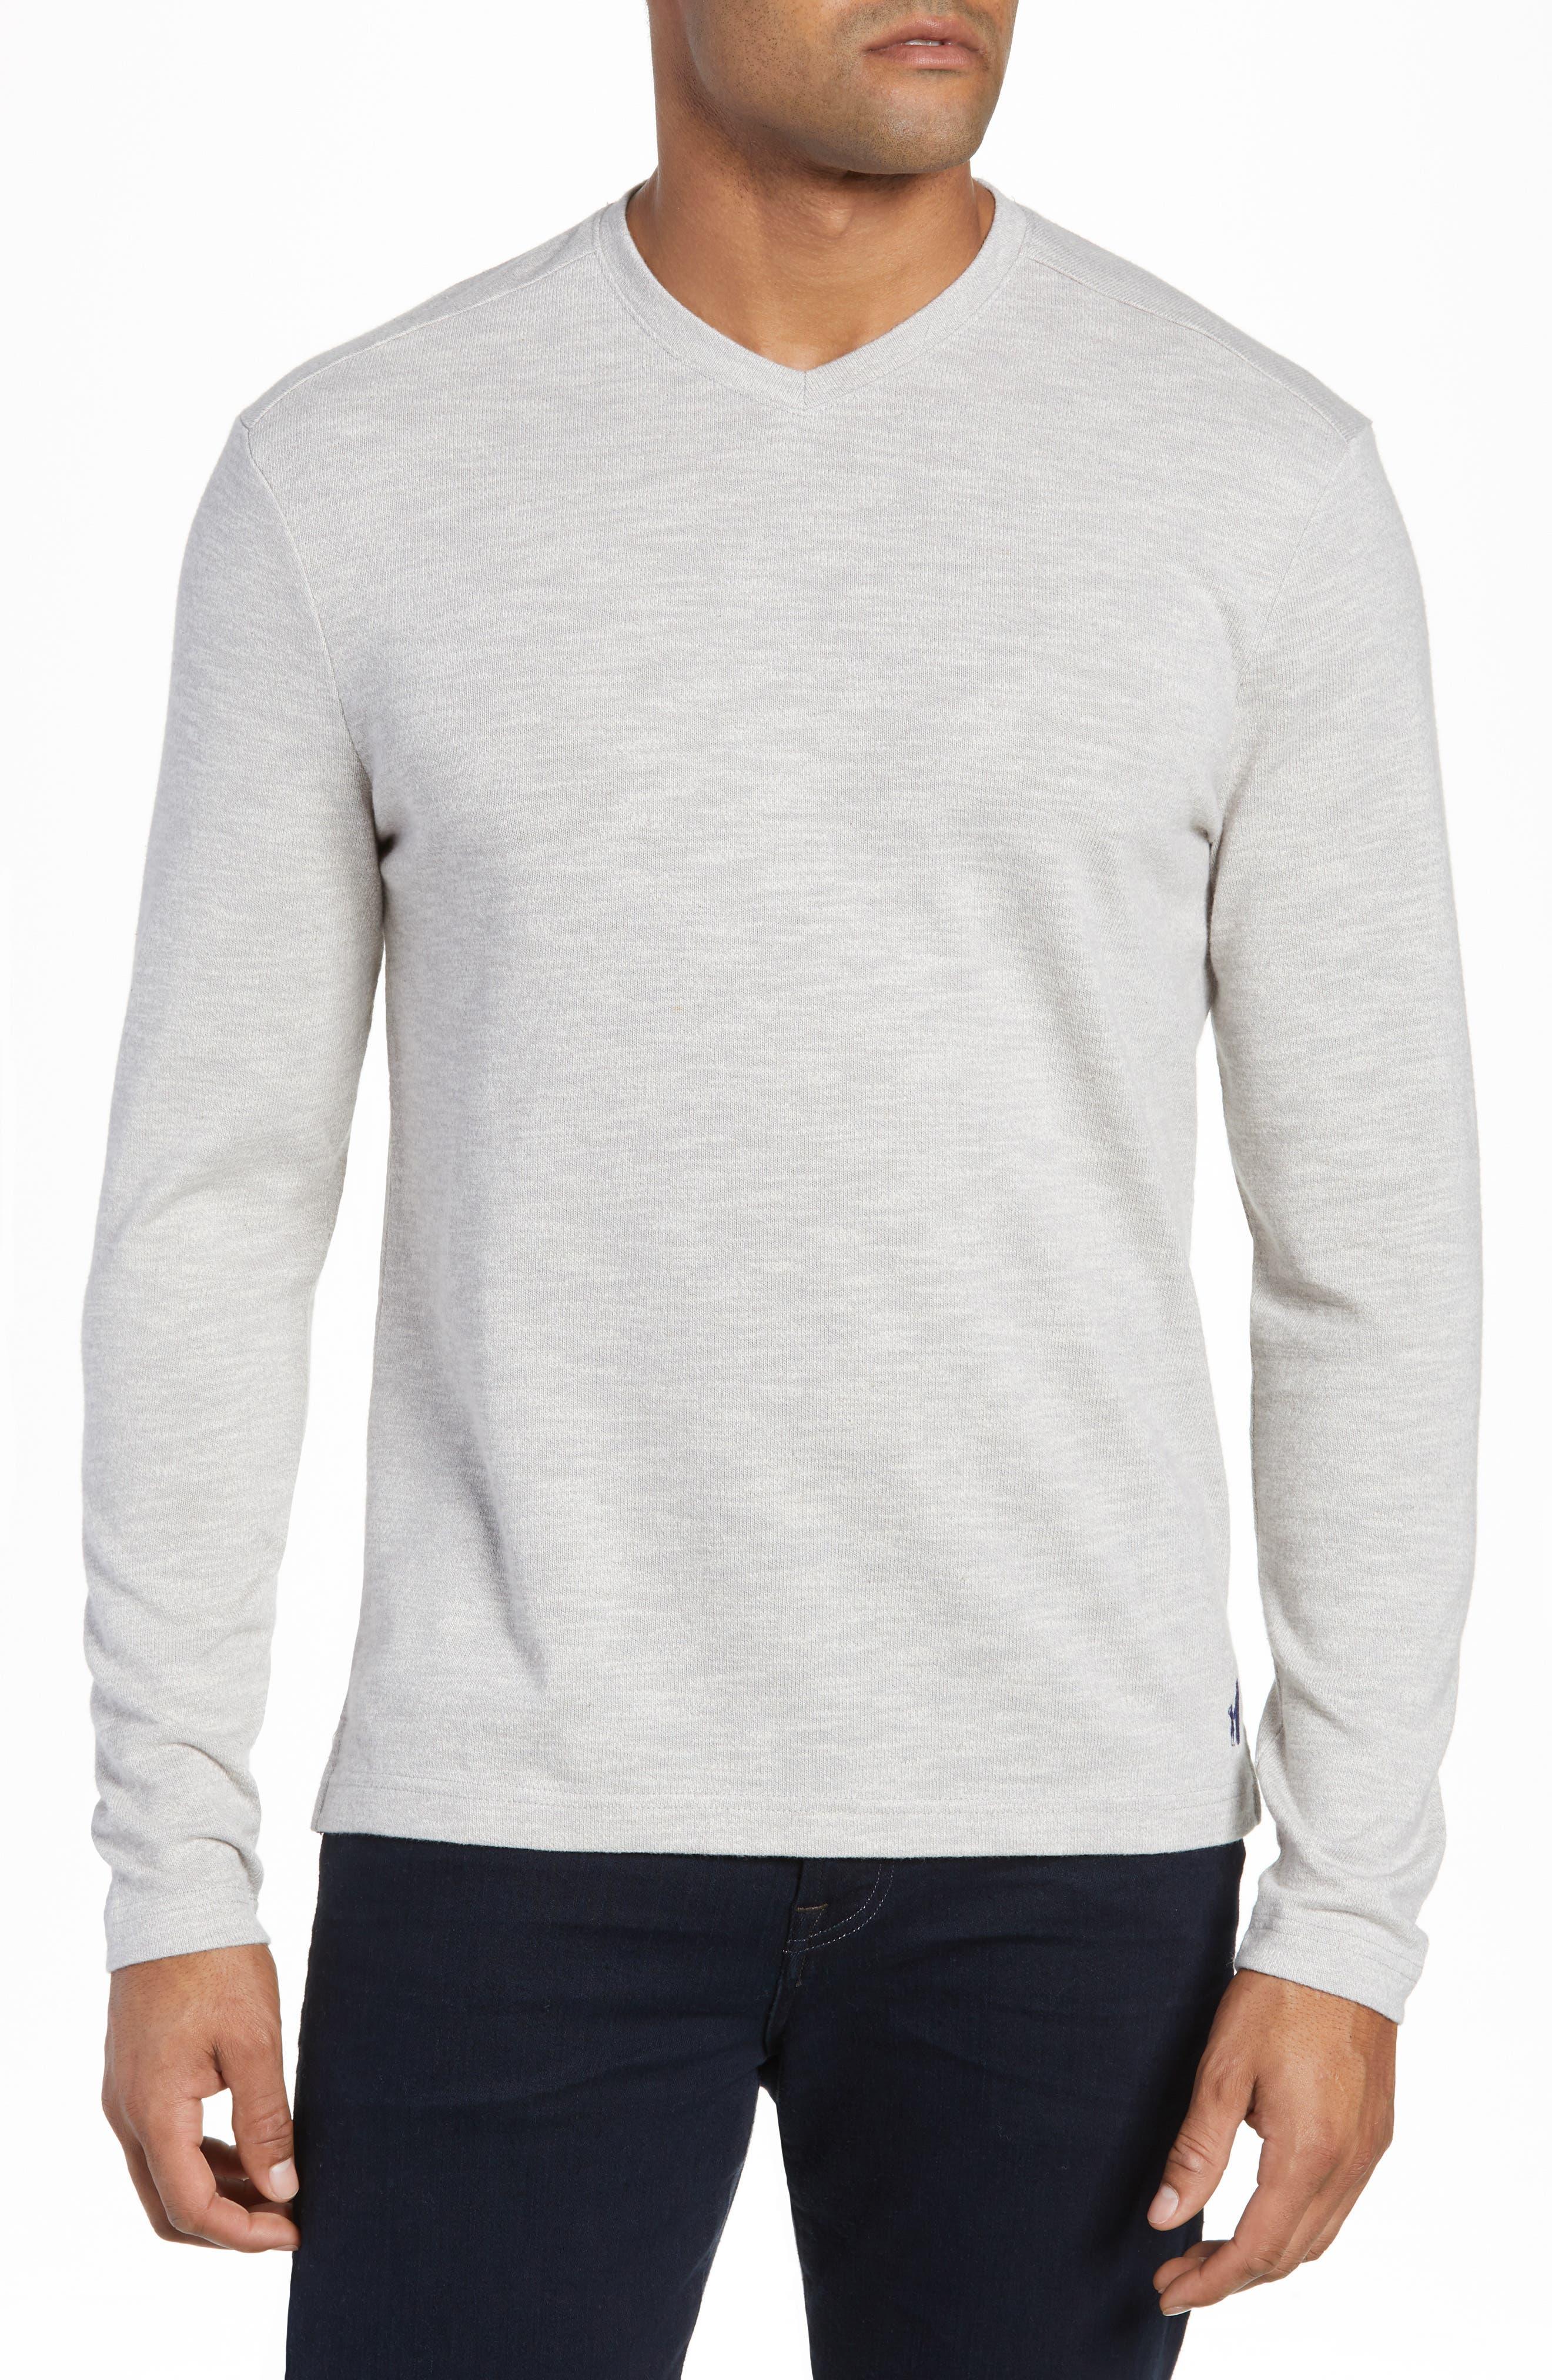 Johnnie-O Cantona Regular Fit Sweater, Grey